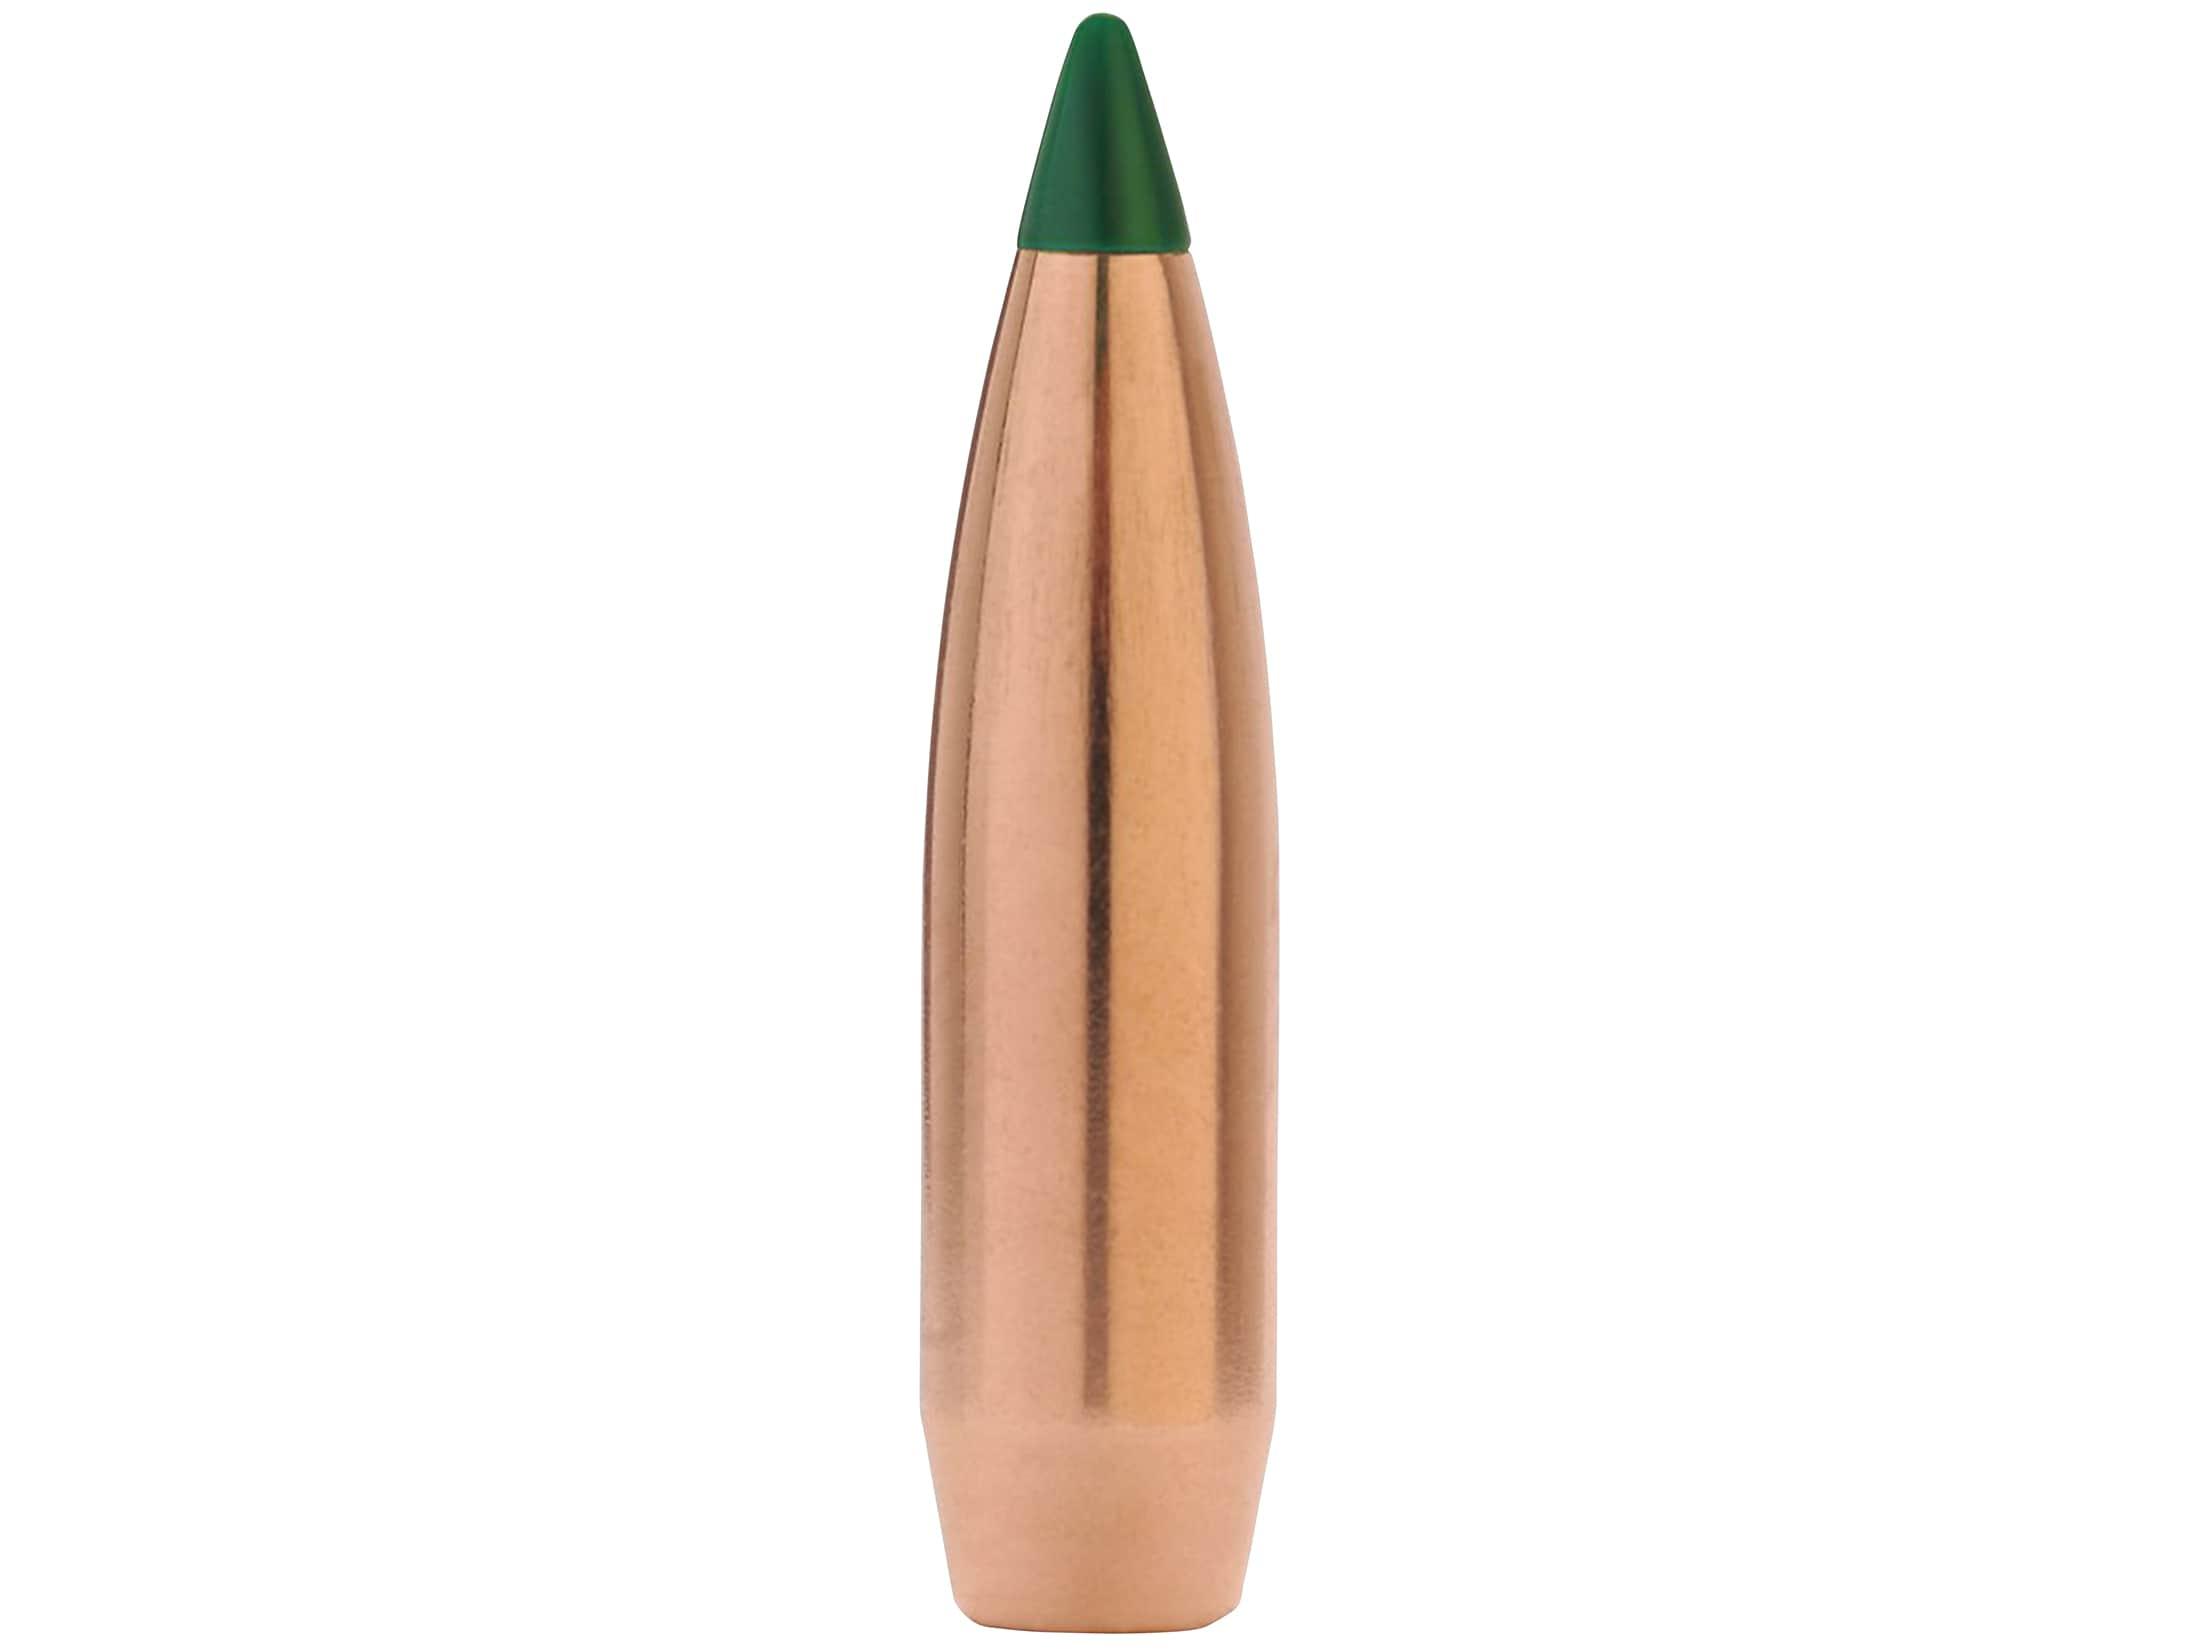 Sierra Tipped MatchKing (TMK) Bullets 22 Cal (224 Diameter) 60 Grain